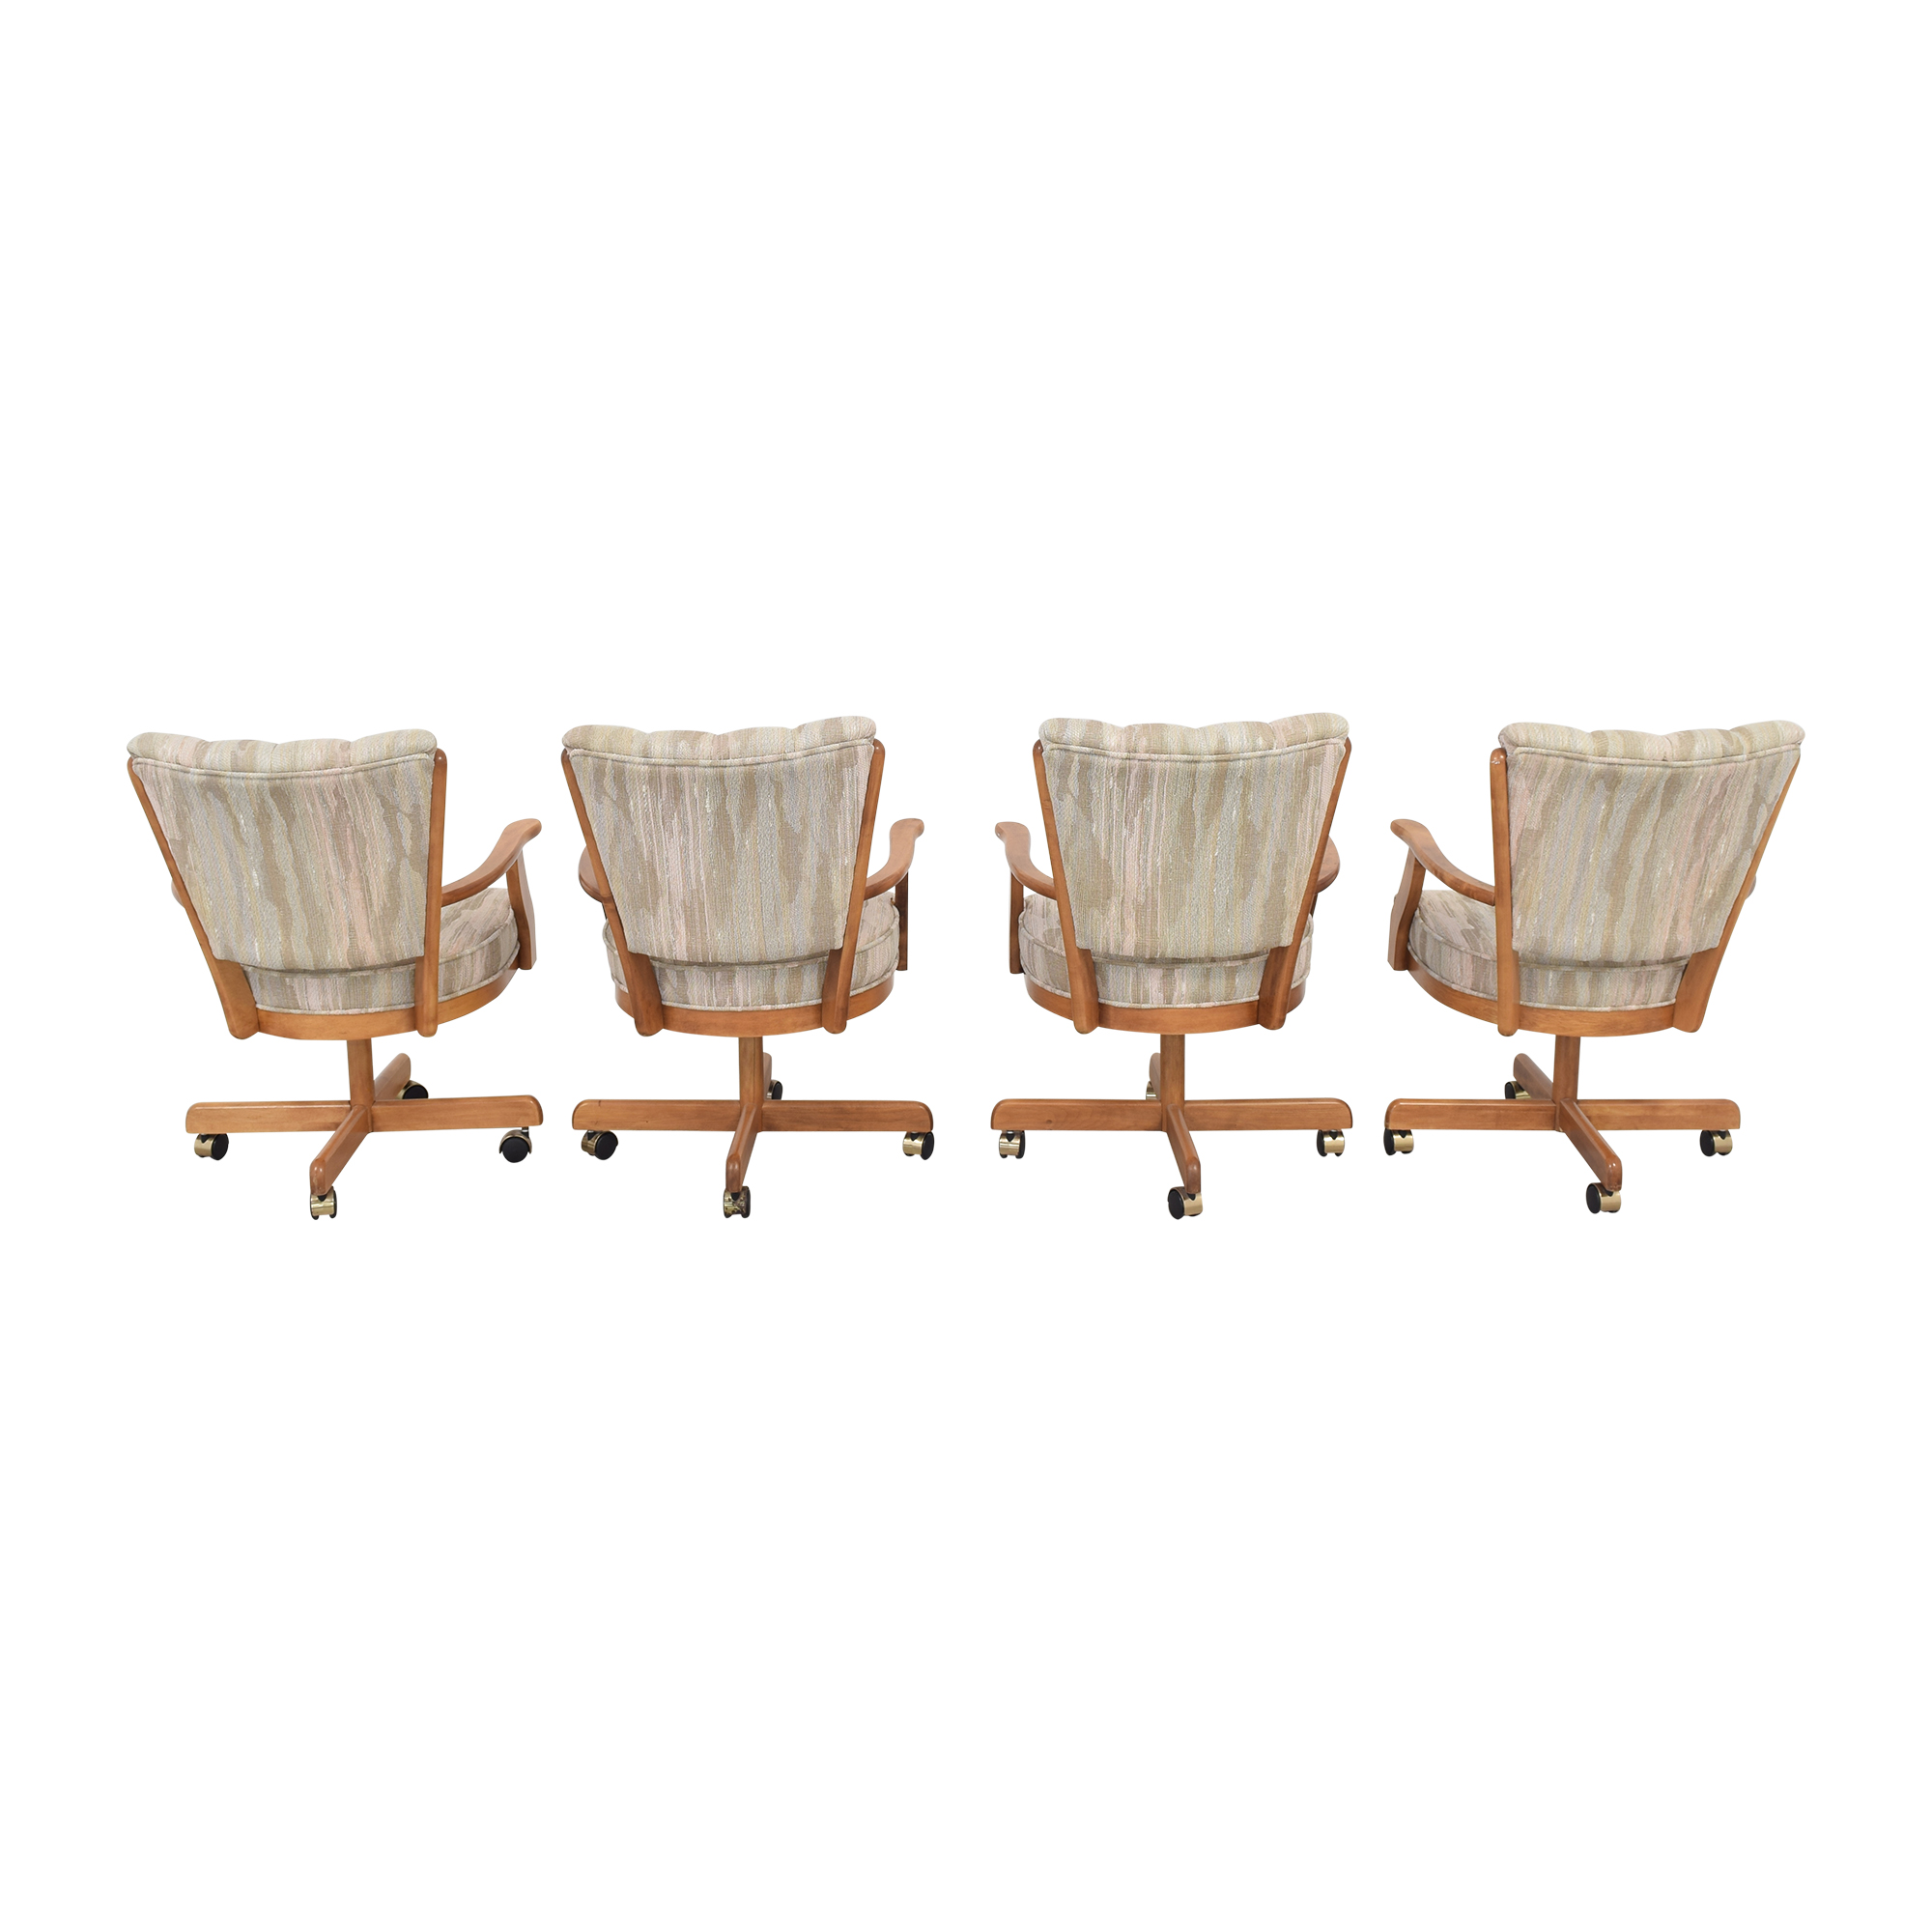 JBW Lustig JBW Lustig Dining Chairs